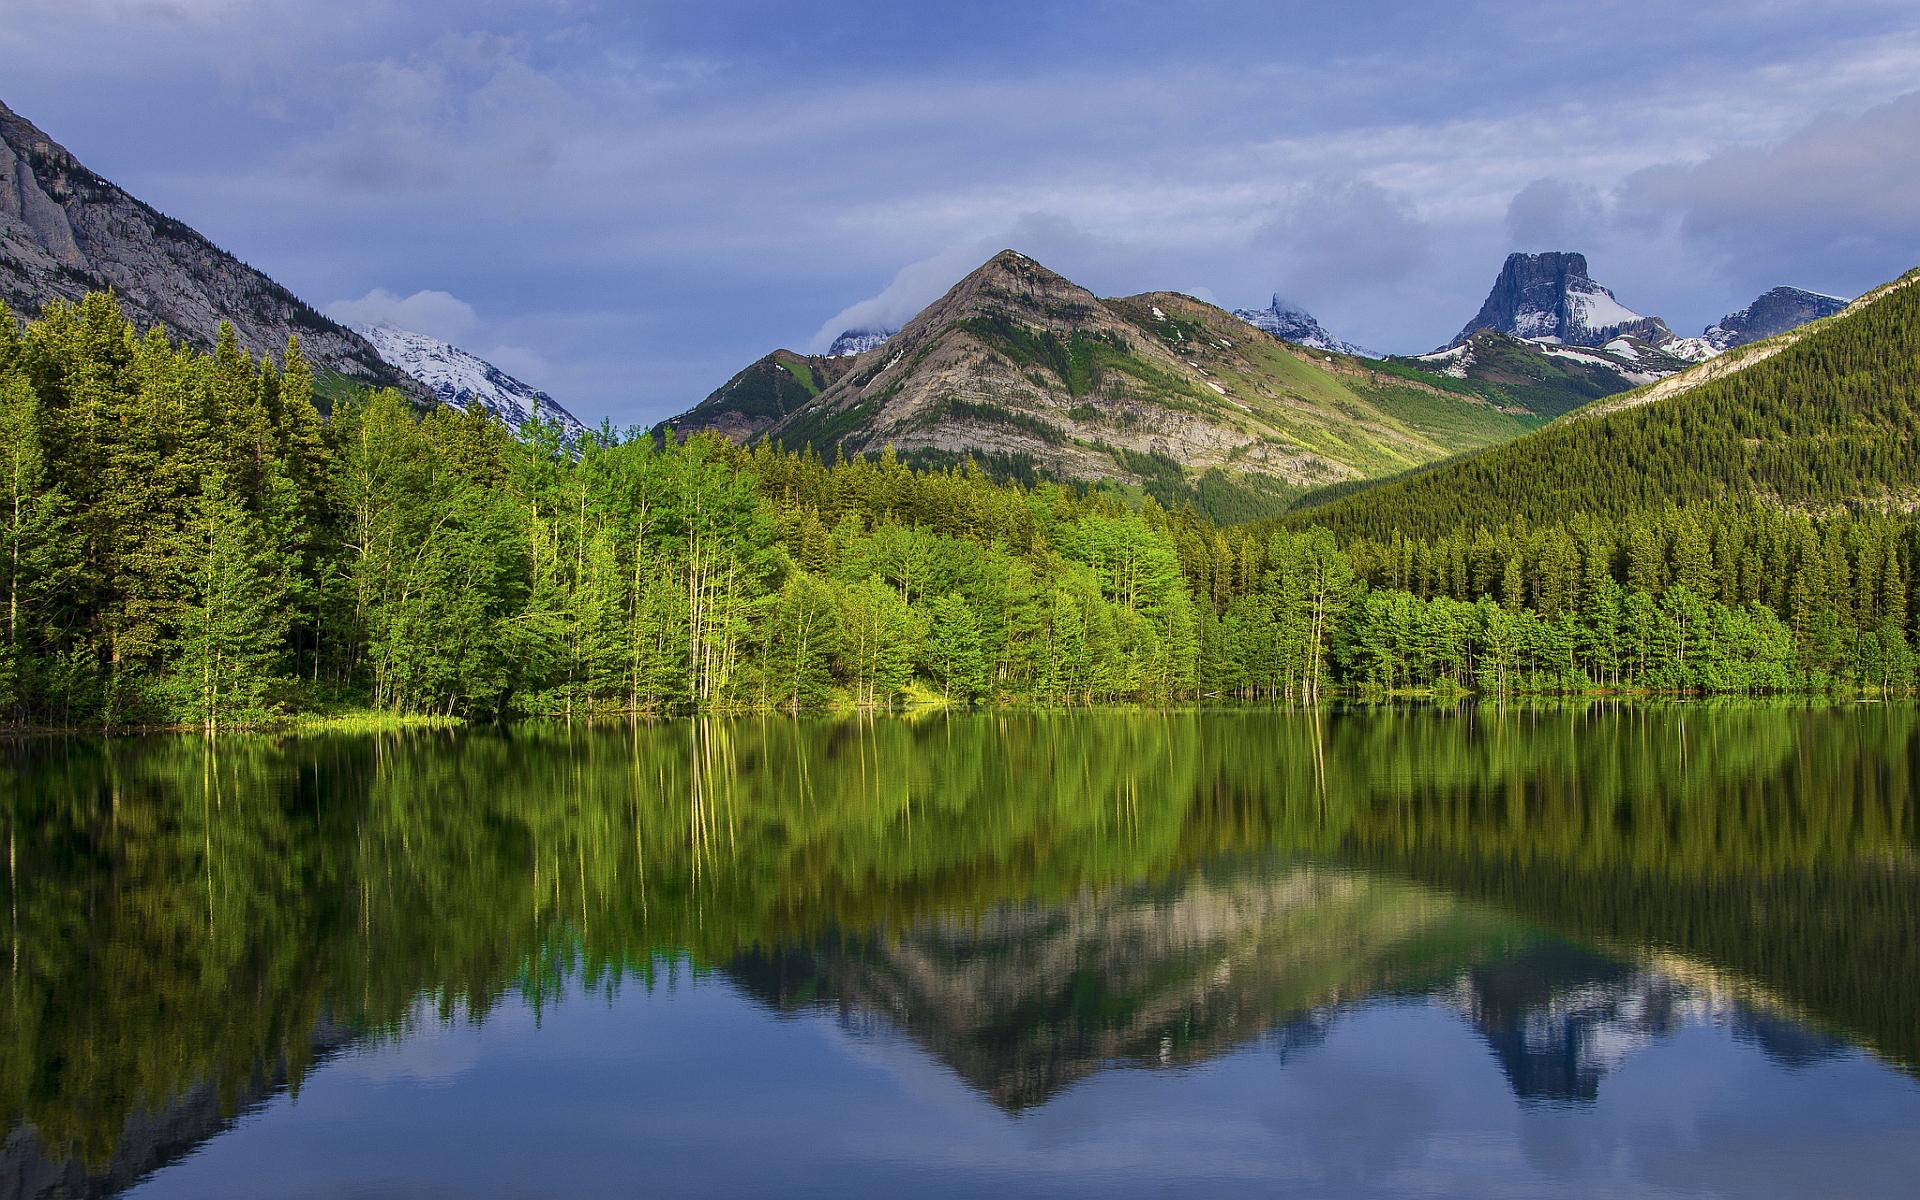 alberta, canada, mountains Wallpaper, HD Nature 4K